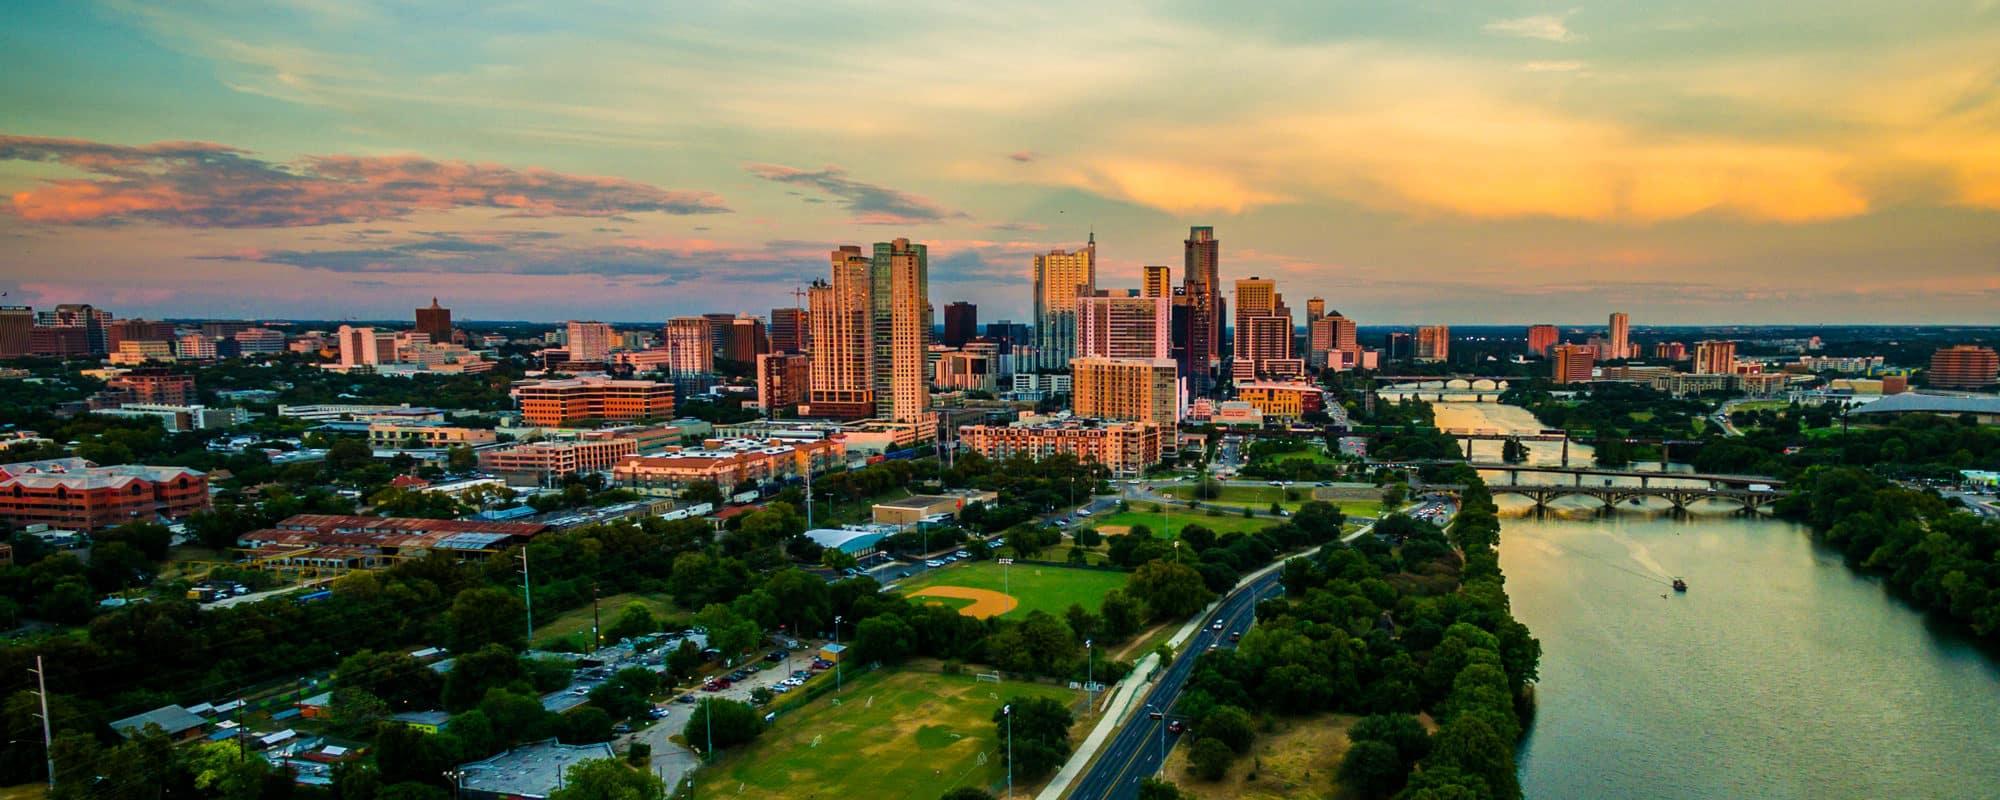 Downtown Austin Skyline and Lady Bird Lake